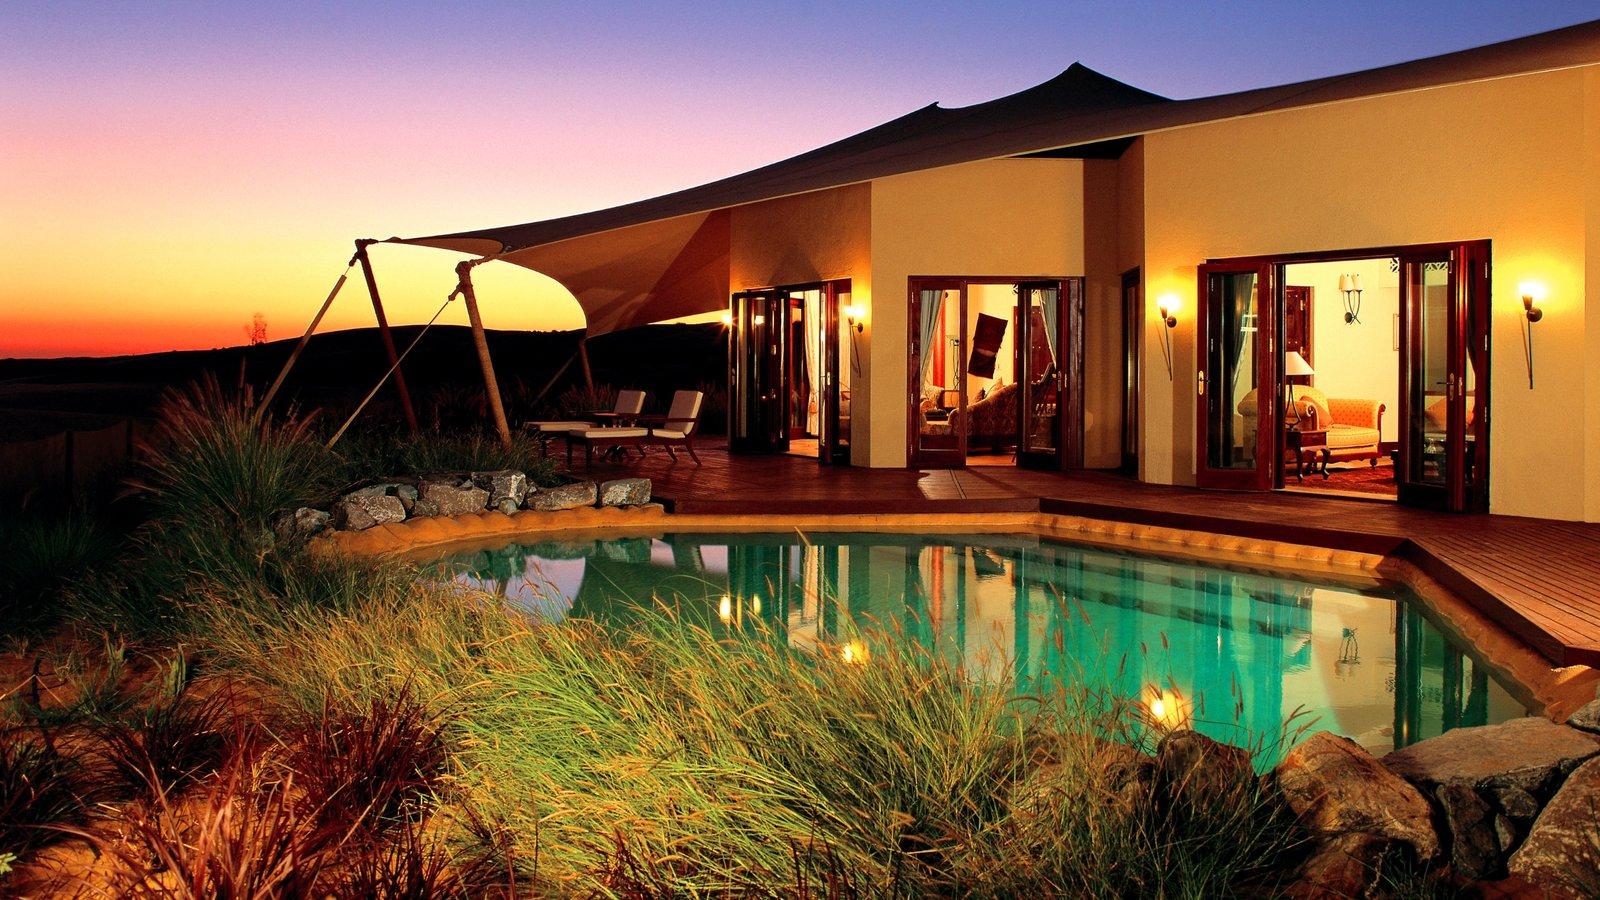 Dubai Desert featuring desert views, a sunset and a luxury hotel or resort